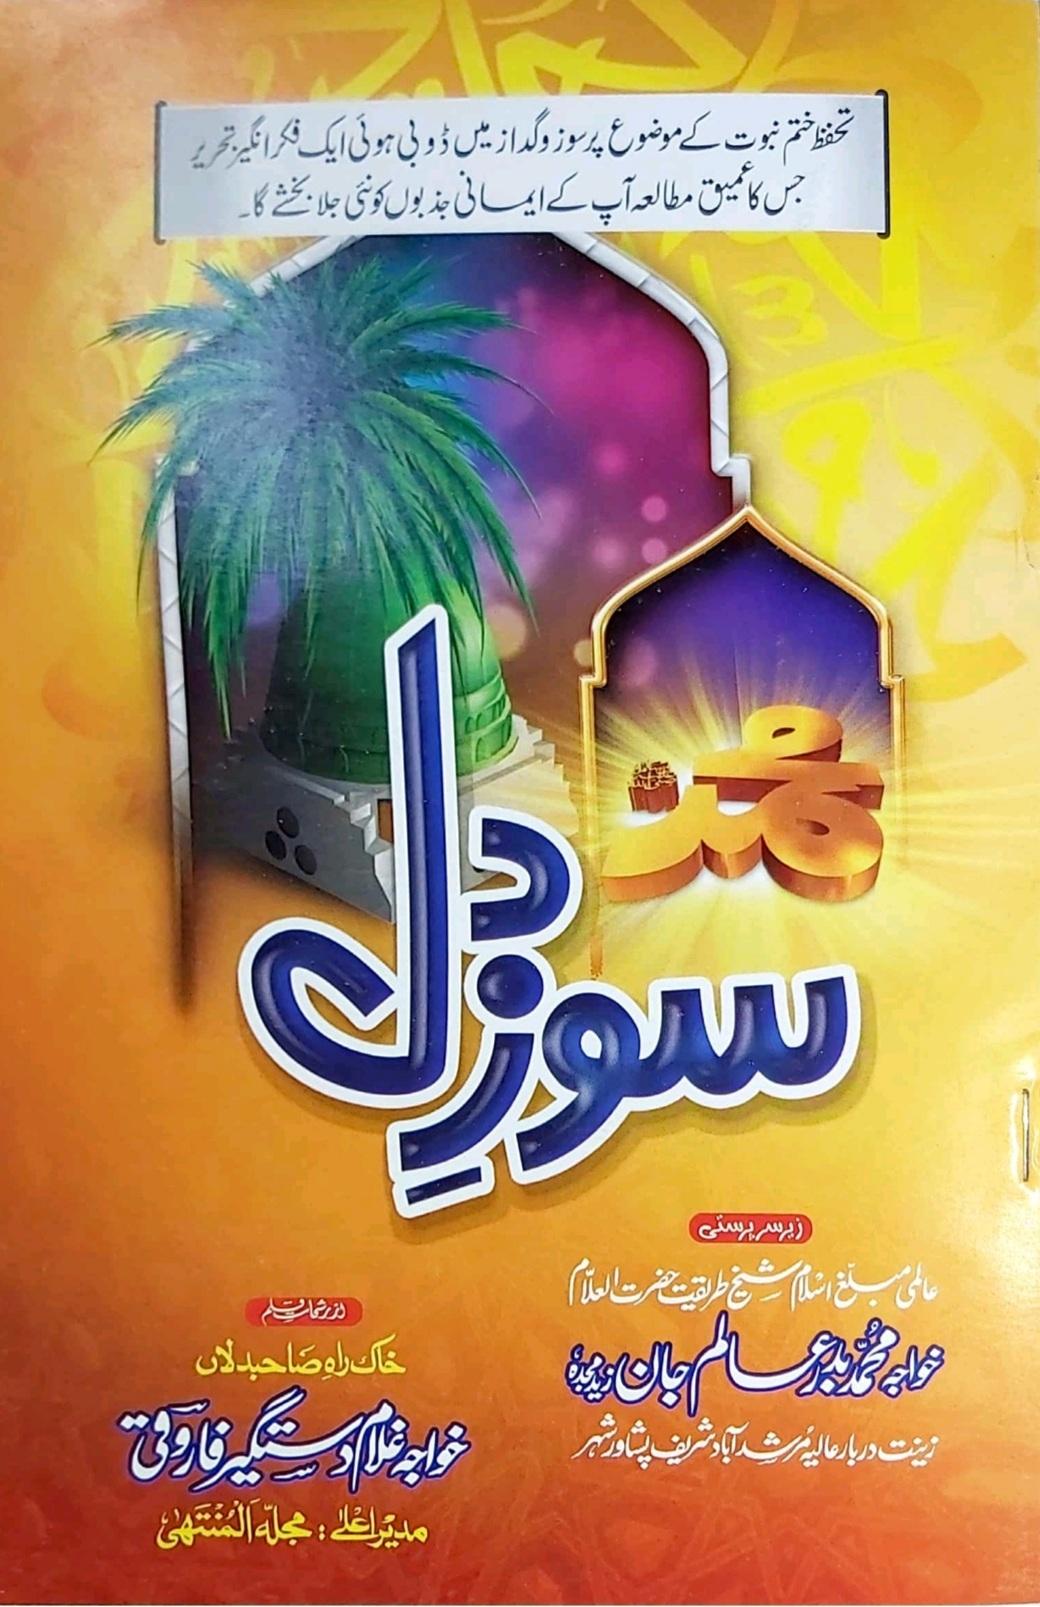 Soze Dill / سوز دلby خواجہ غلام دستگیر فاروقی